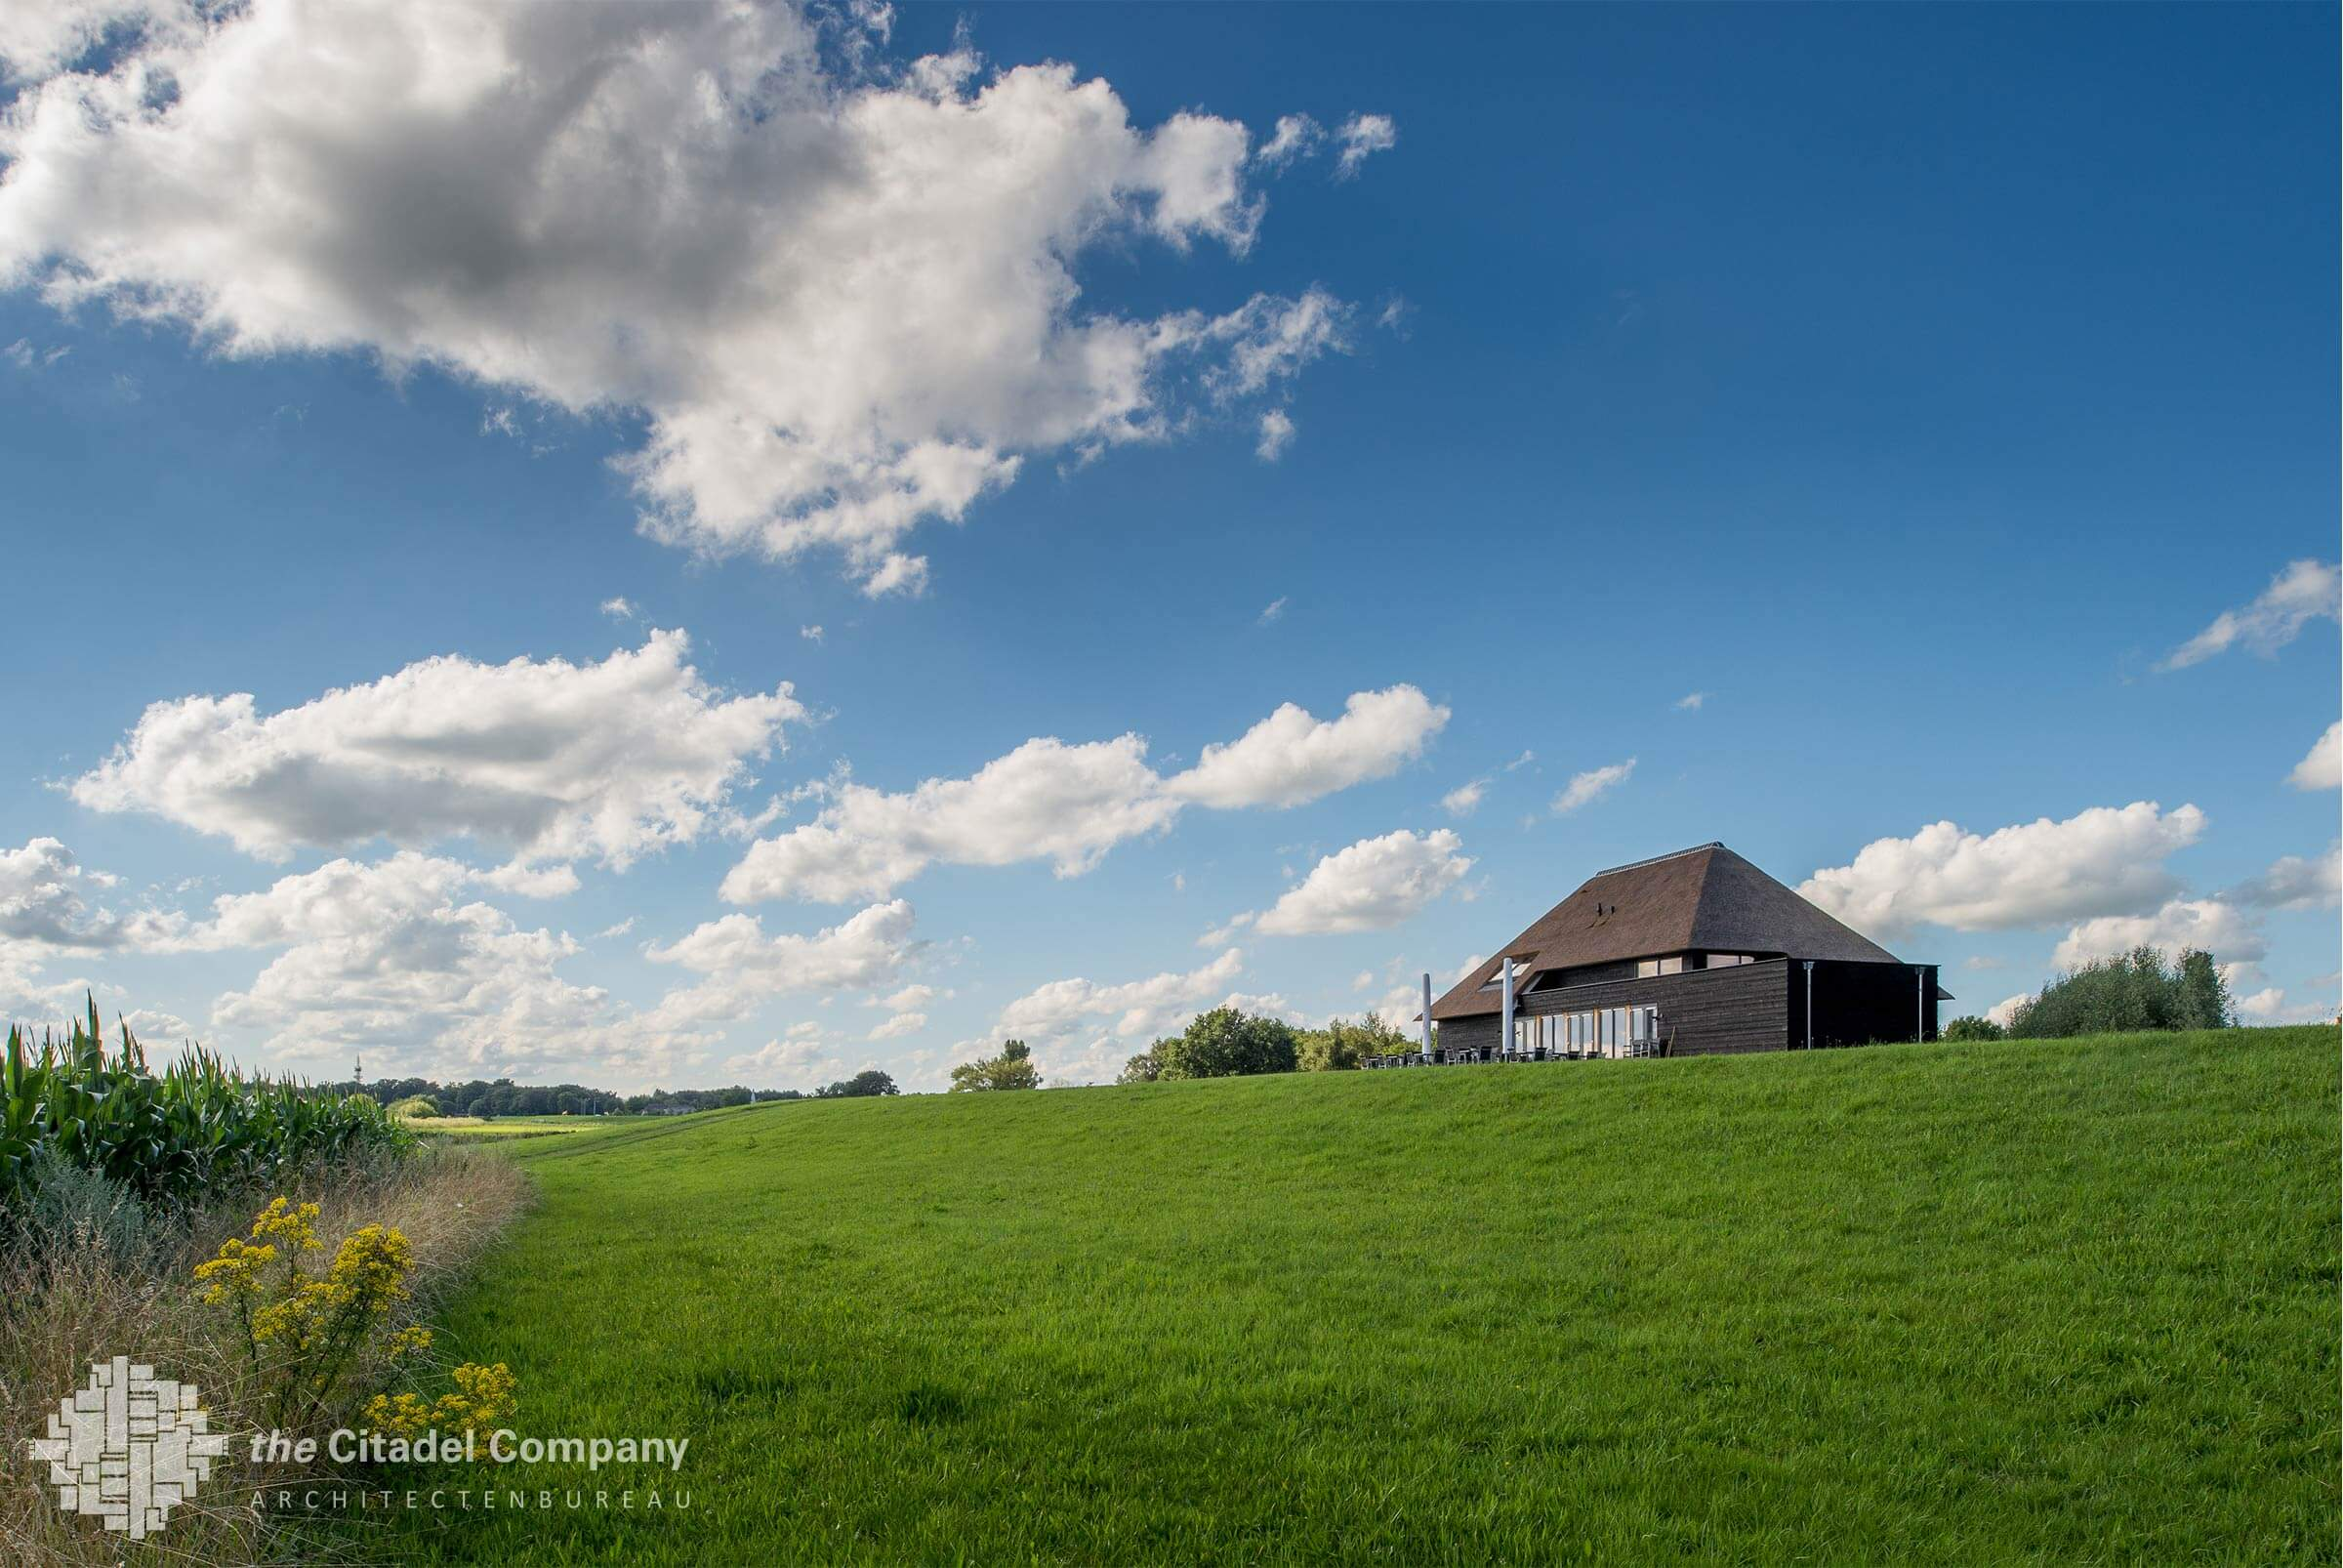 Nieuwbouw Dijkmoment Zwolle